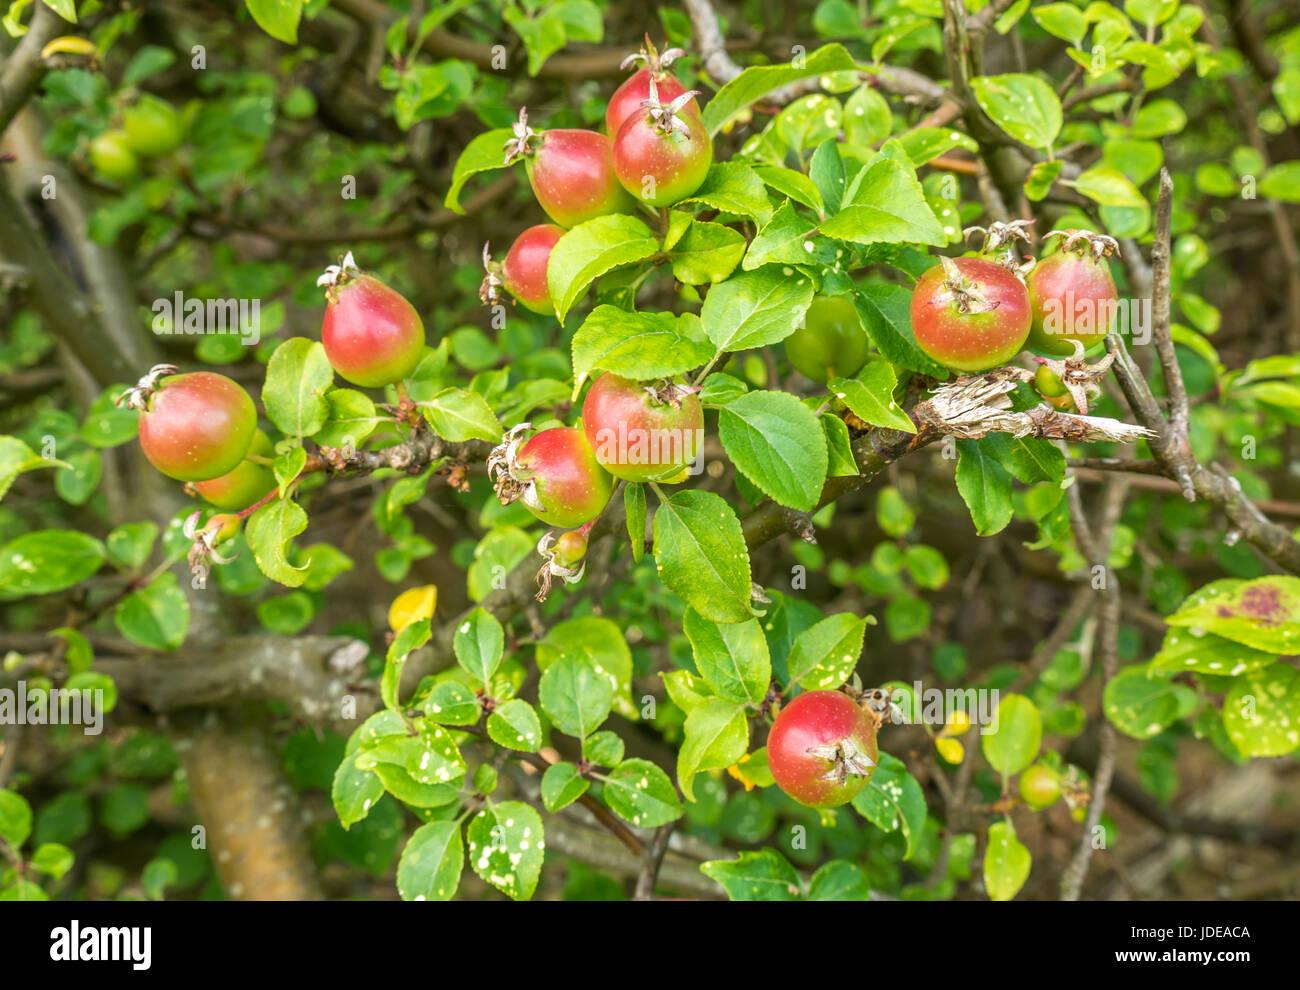 wild-crab-apples-malus-sylvestris-growin